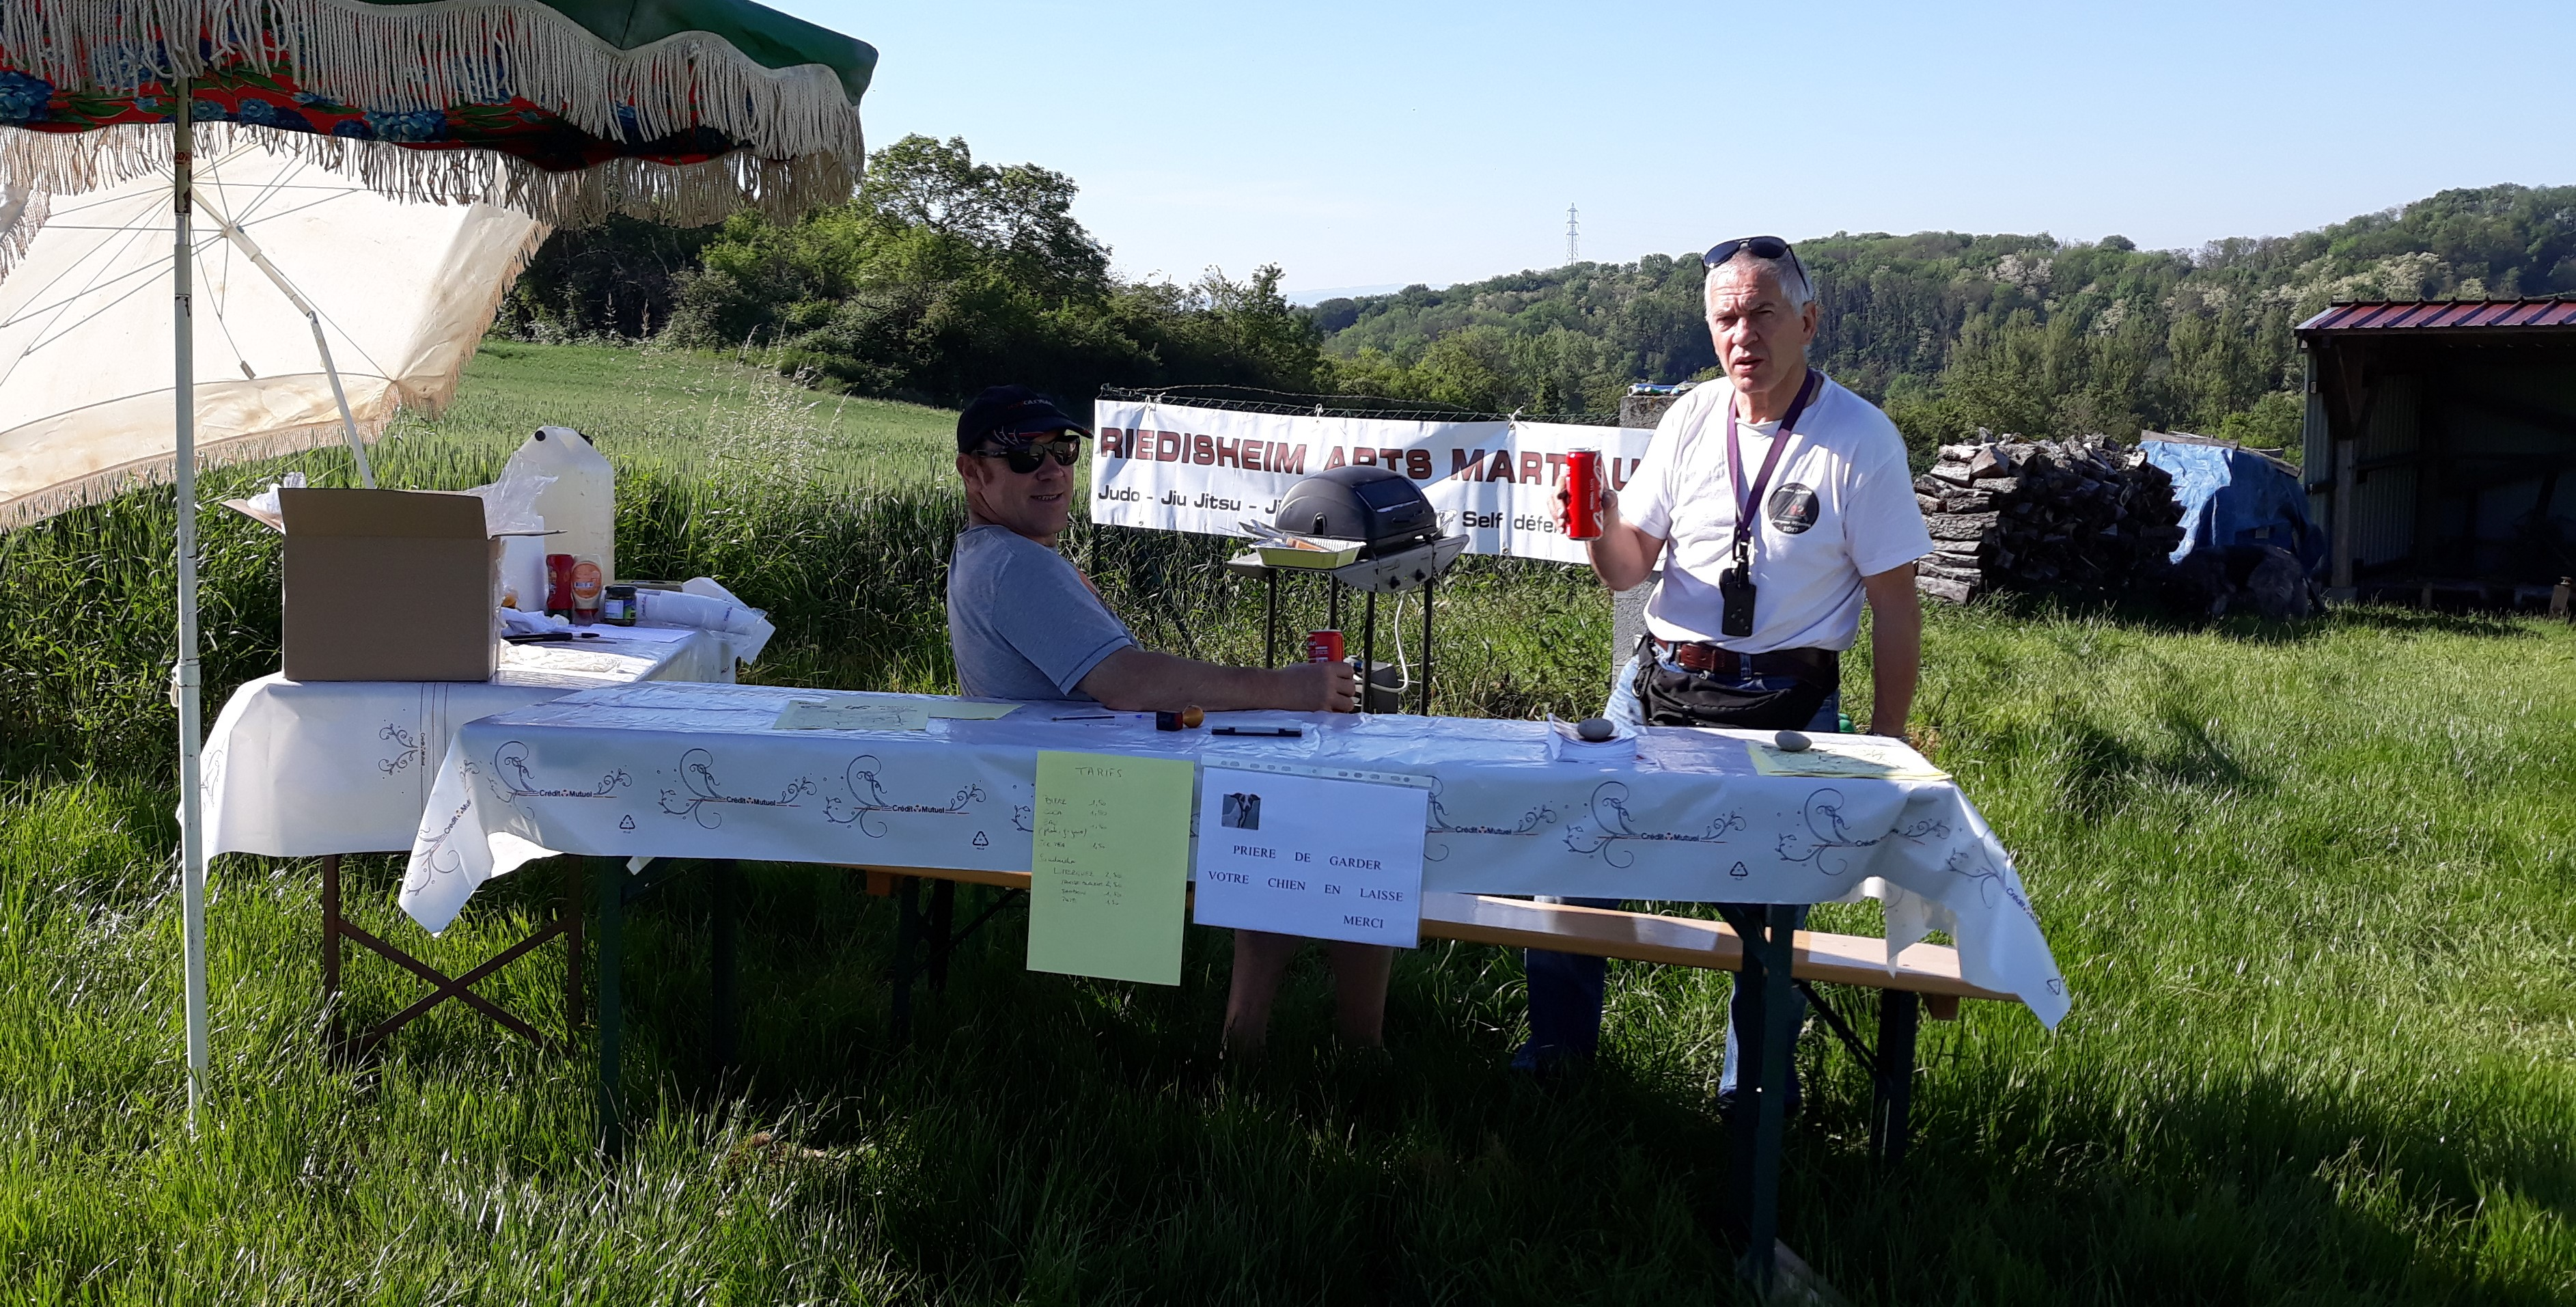 Riedisheim Arts Martiaux à la Marche de la Biche